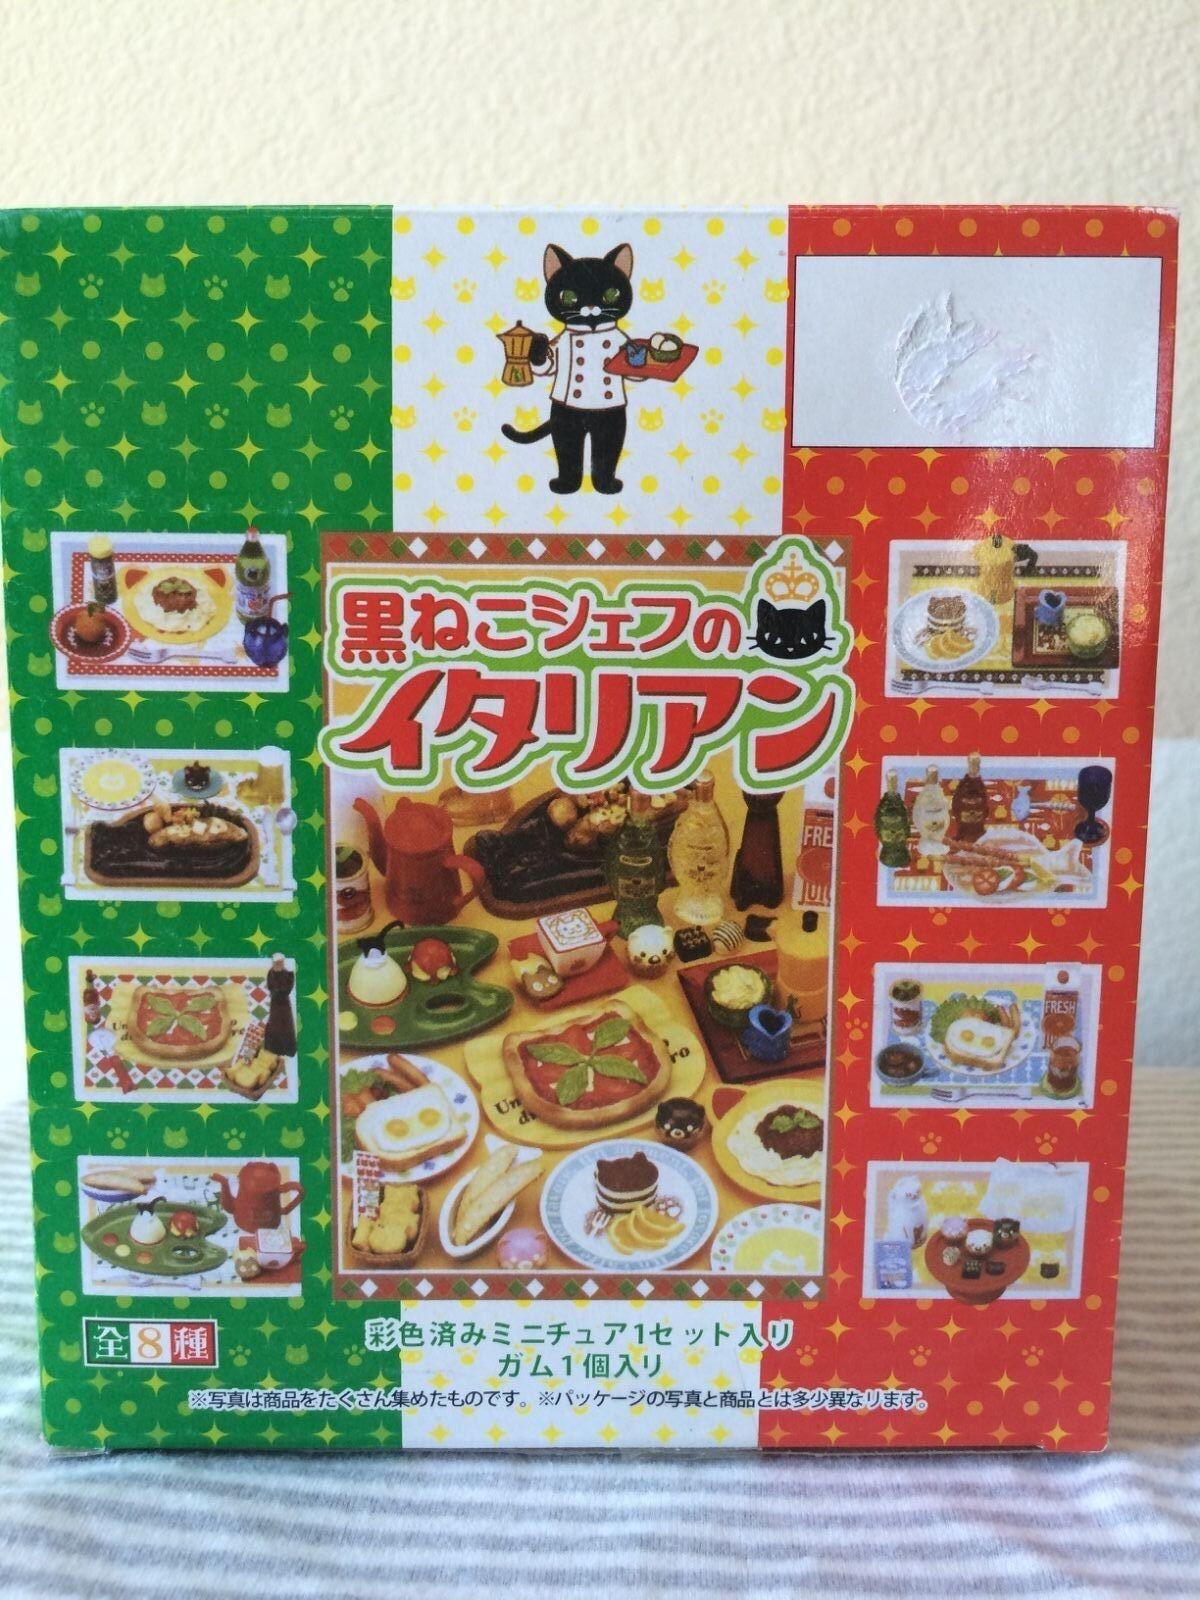 Megahouse miniaturas Gato Negro Cafe, completa  1-8, 1 6 Cocina Barbie alimentos re-ment